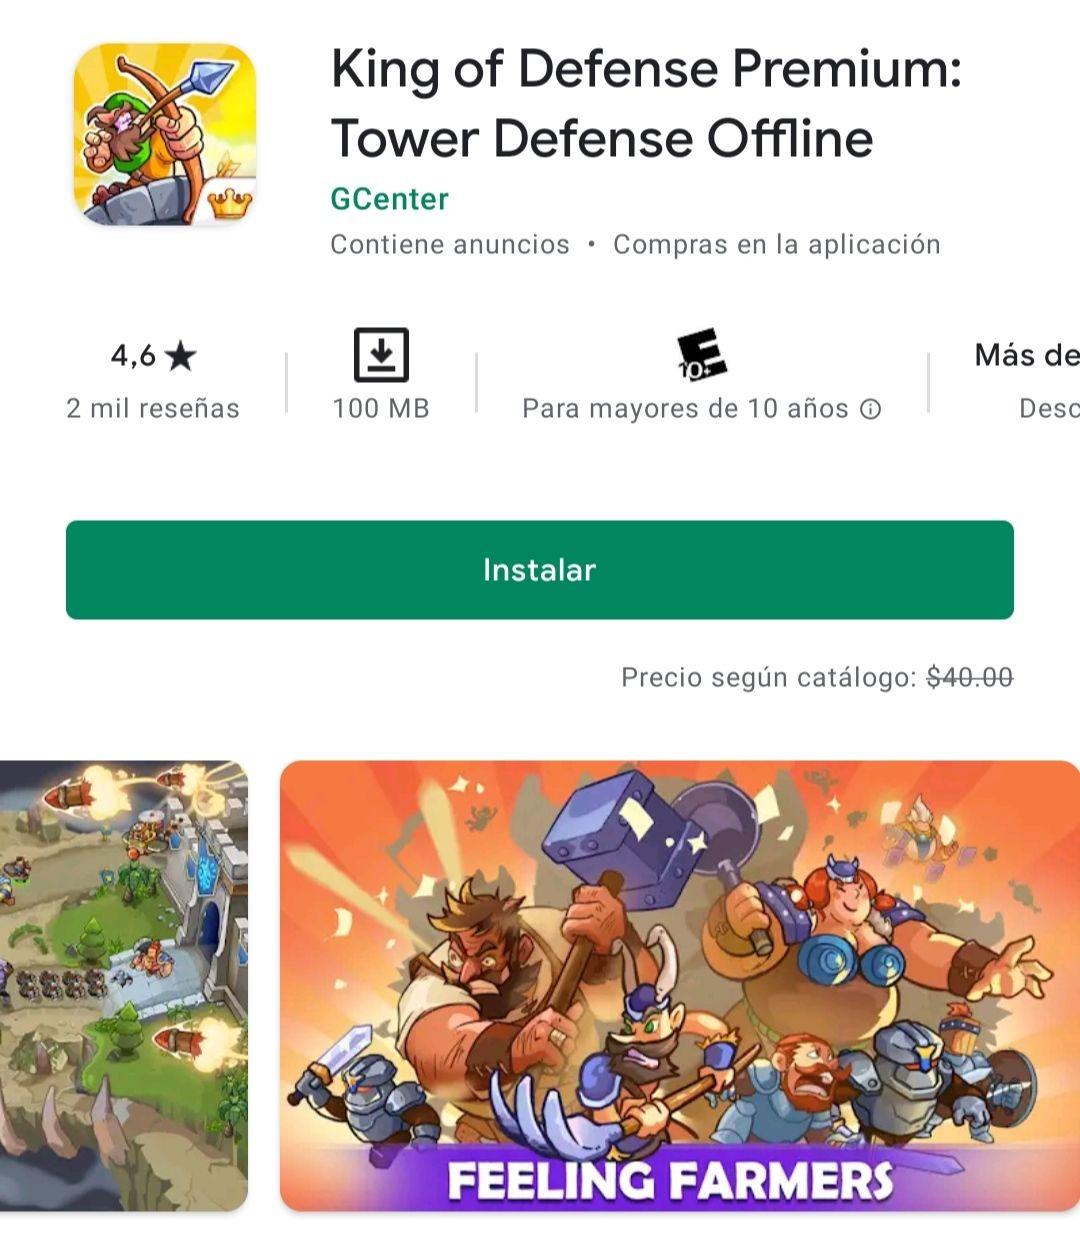 Google Play: King of Defense Premium: Tower Defense Offline